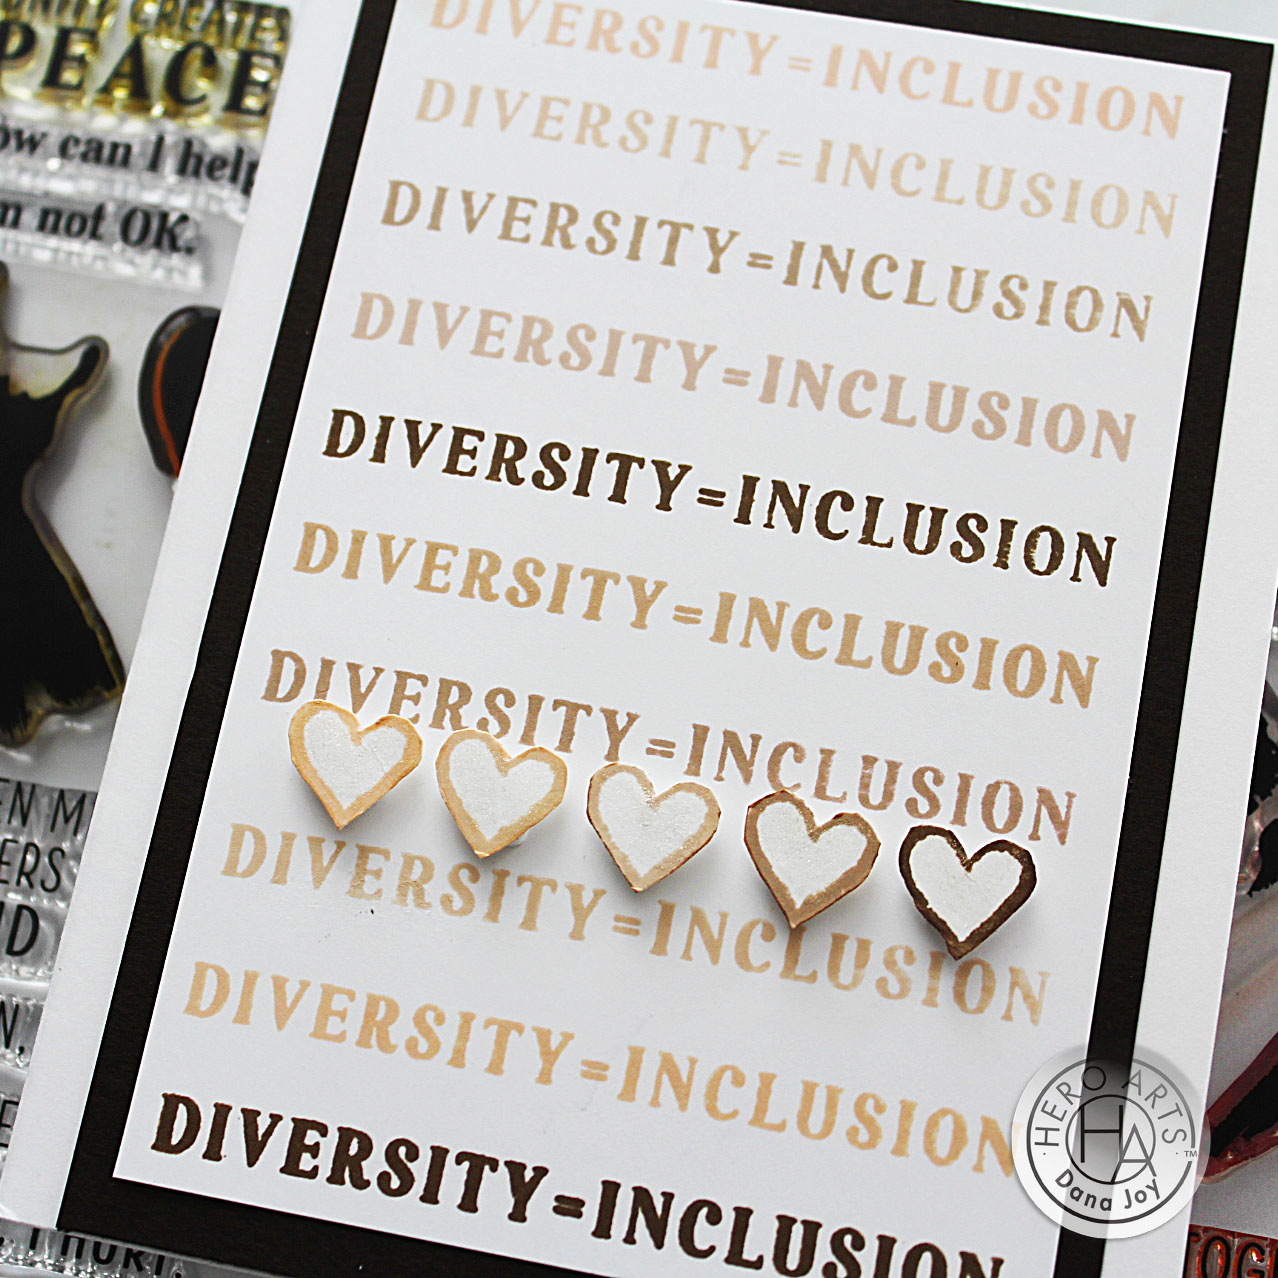 Diversity=inclusion